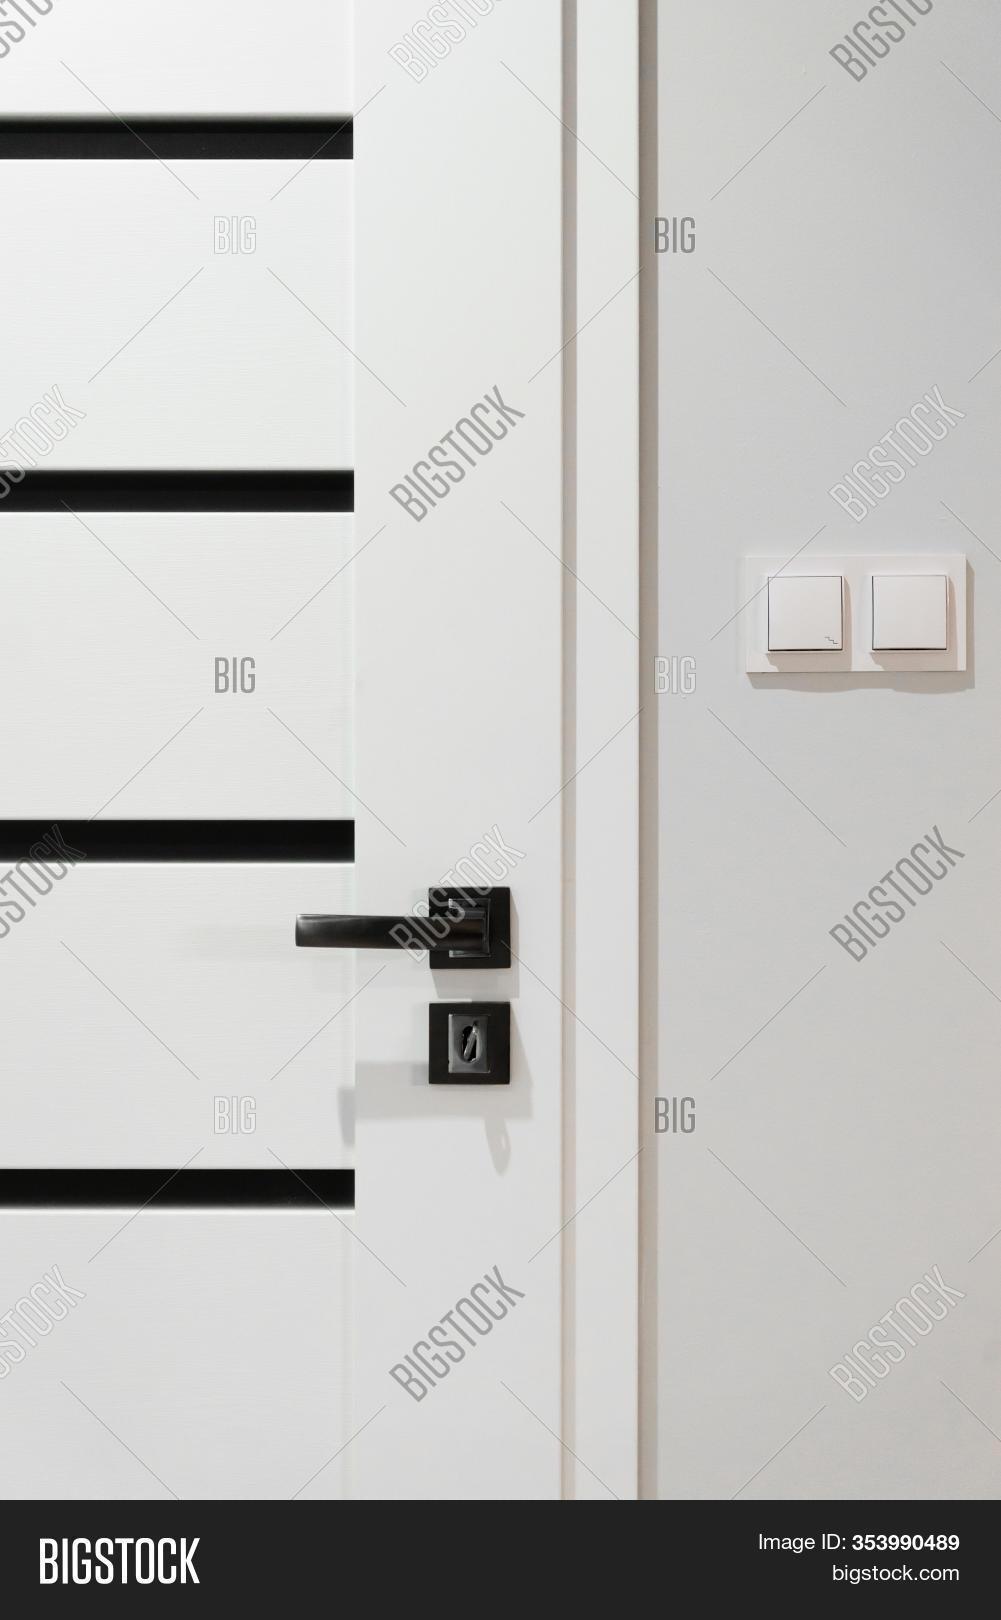 Modern Home Door Knob Image Photo Free Trial Bigstock